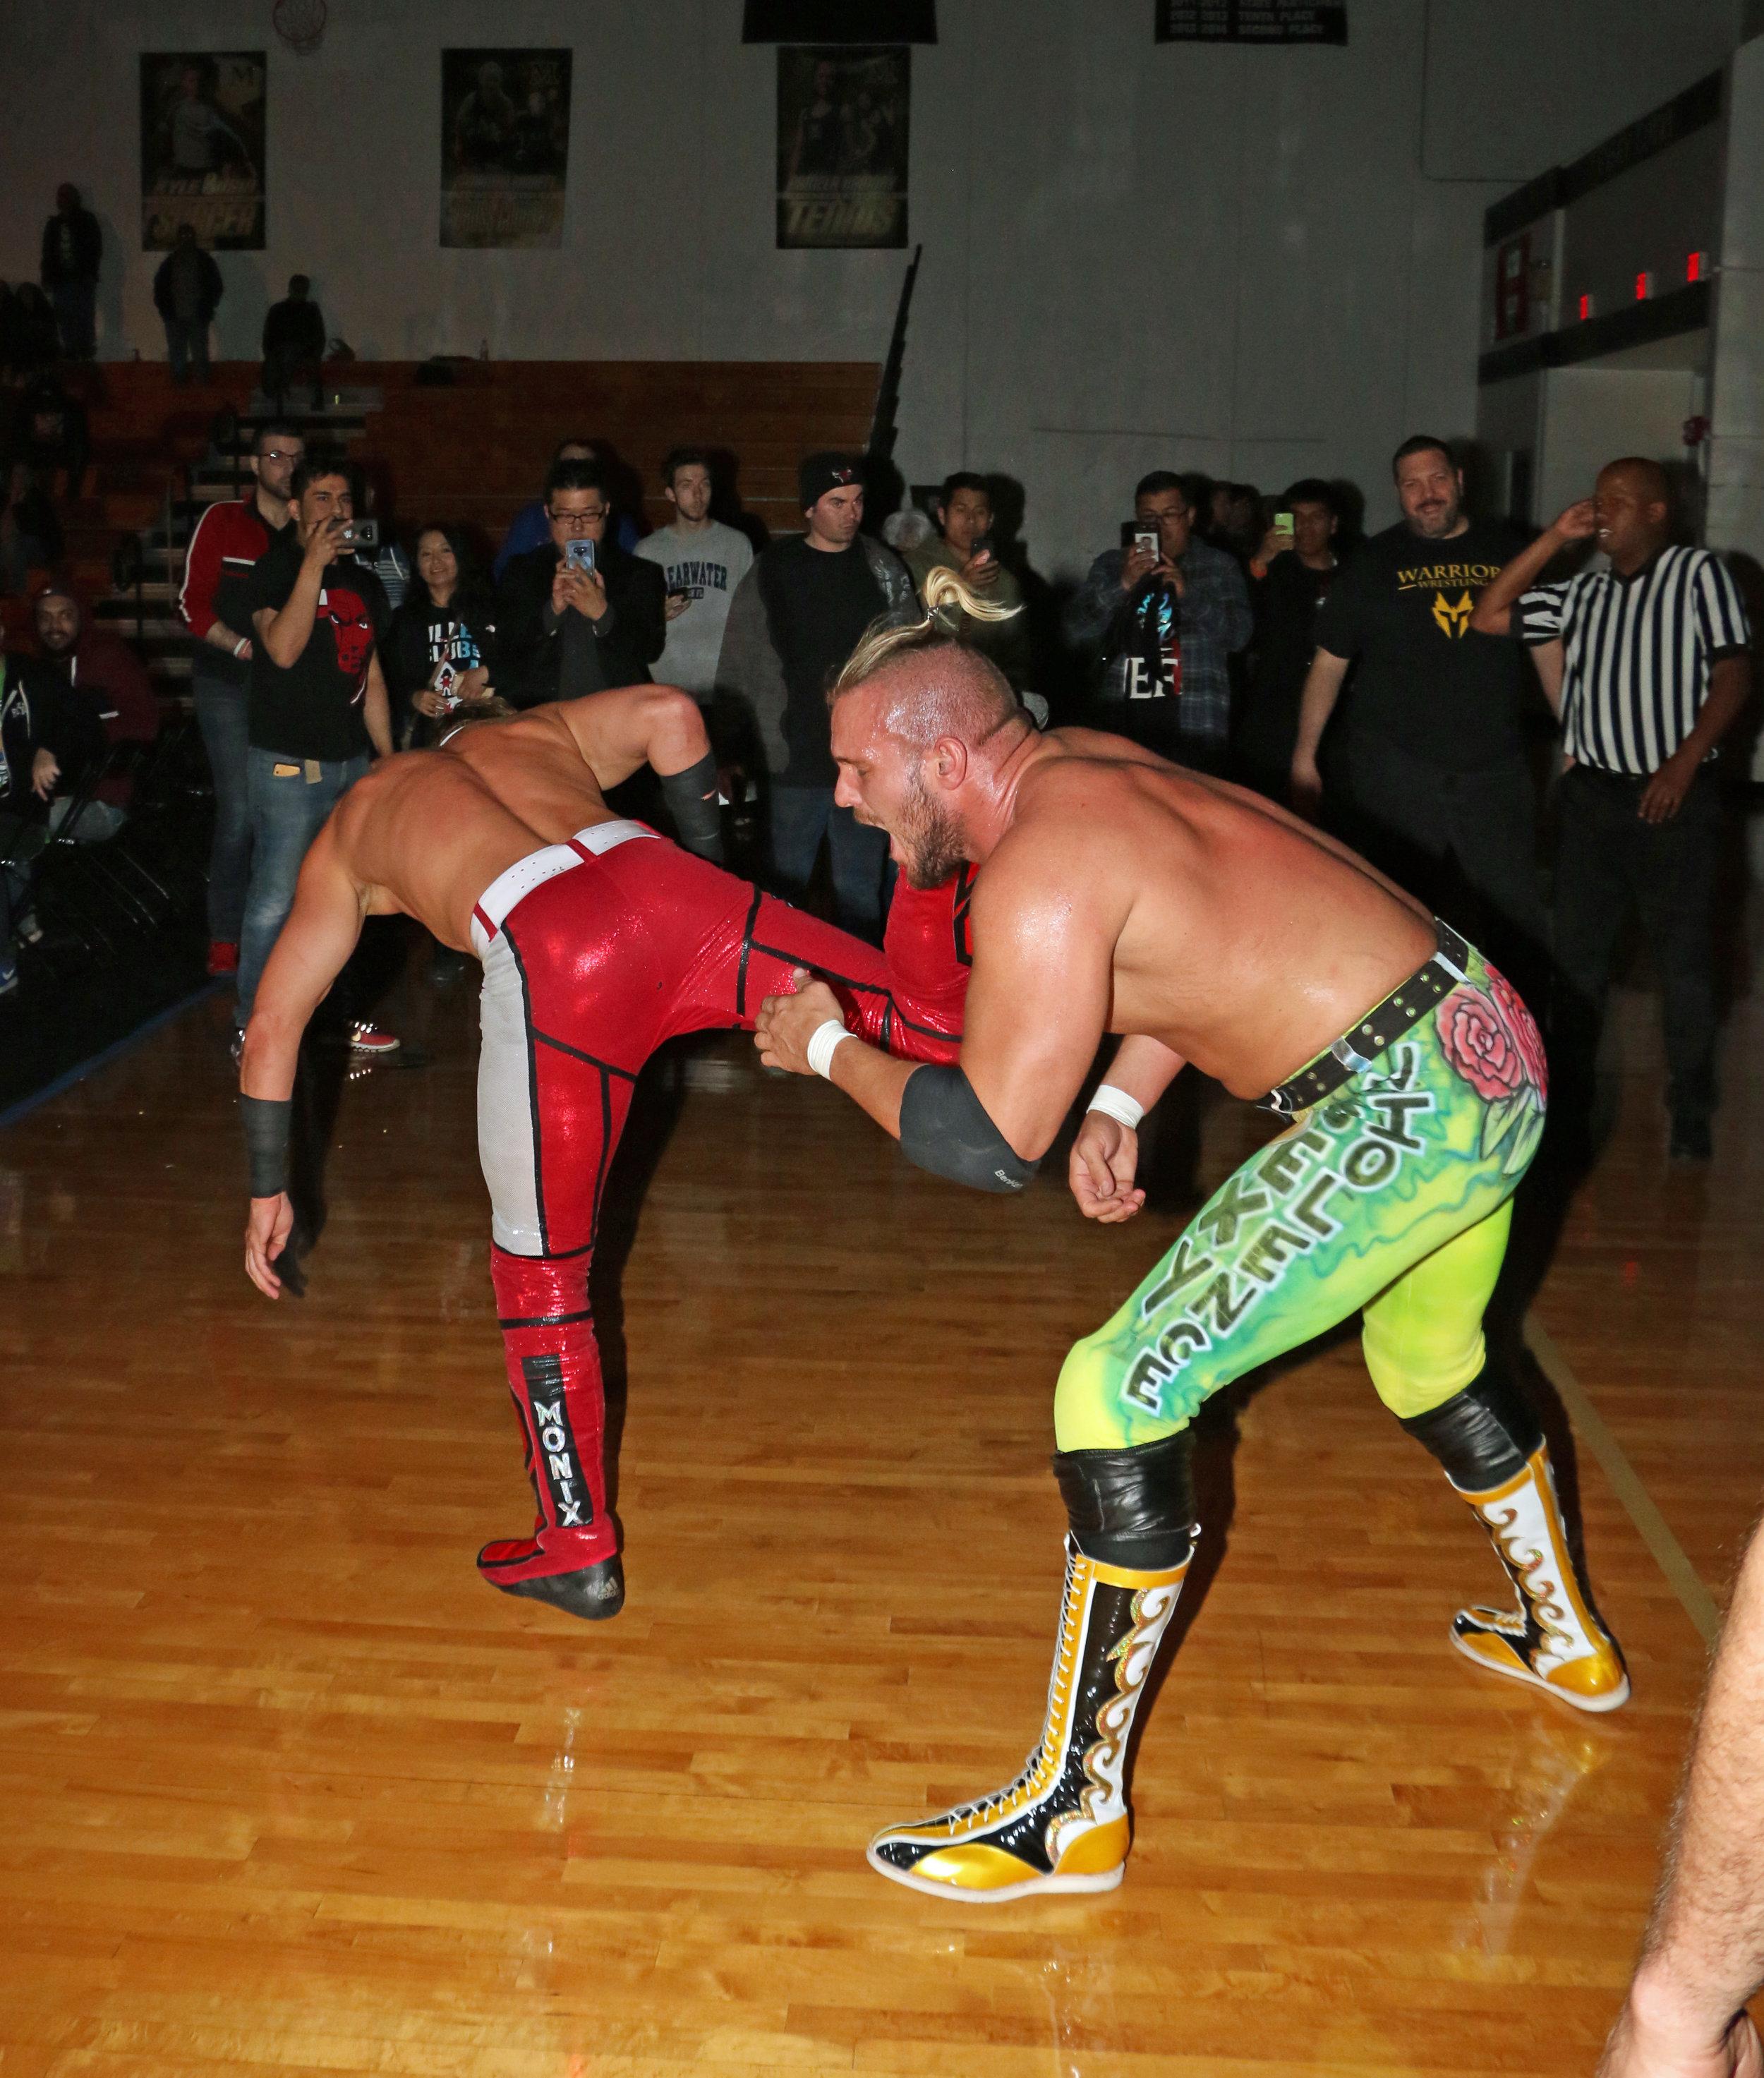 Pat Monix kicks Sam Adonis on the outside.